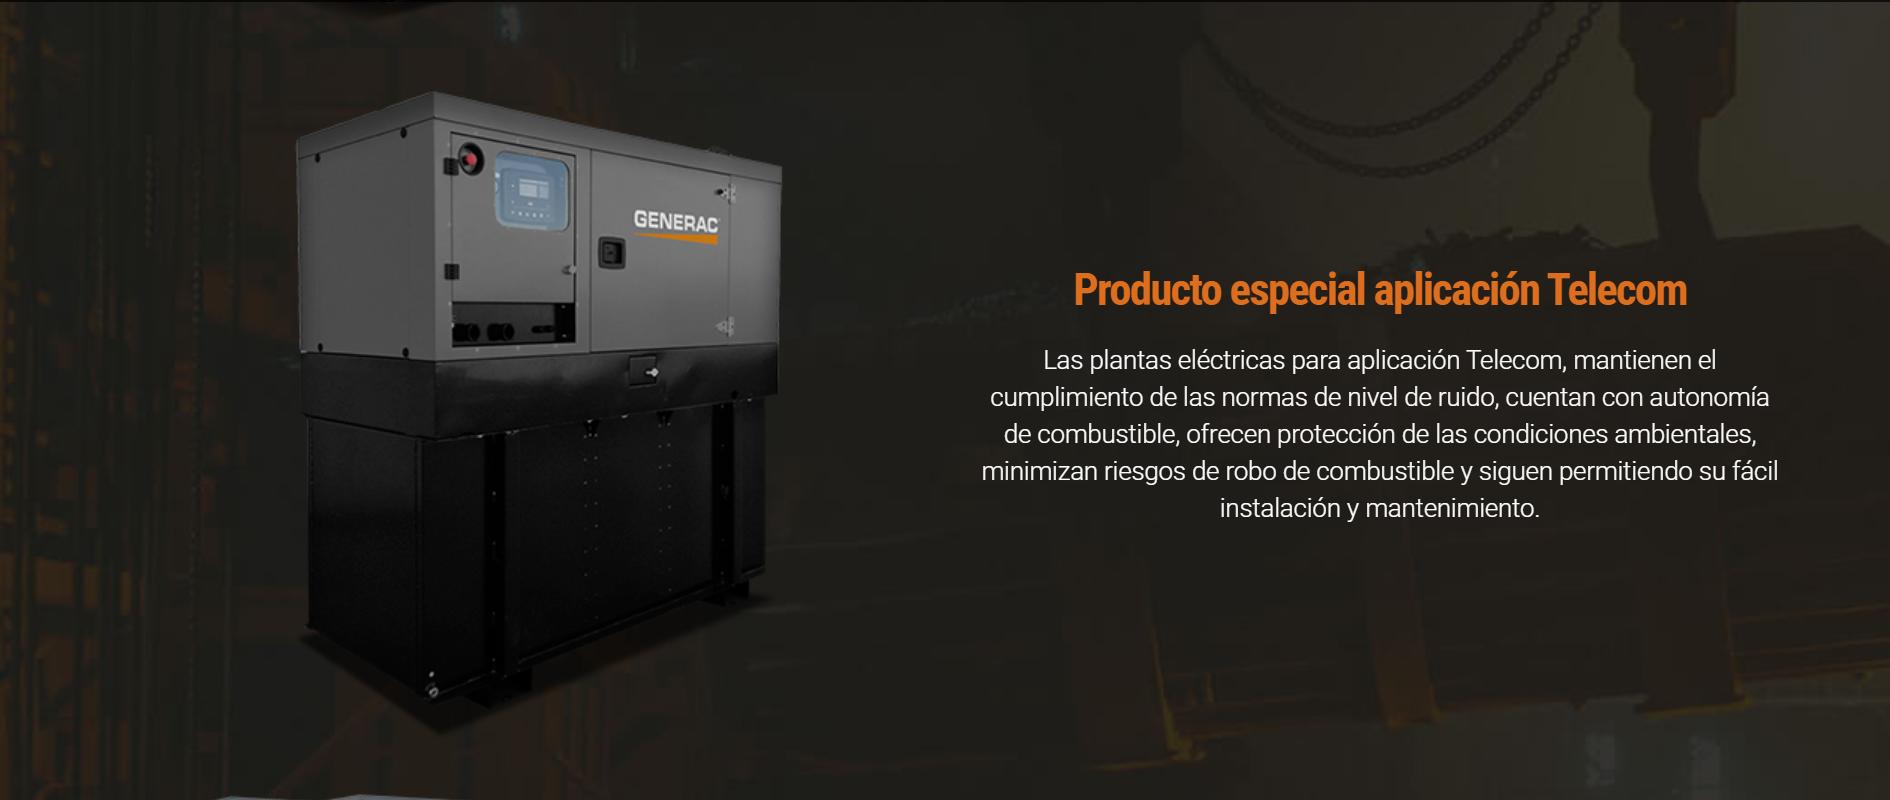 Producto especial aplicación Telecom